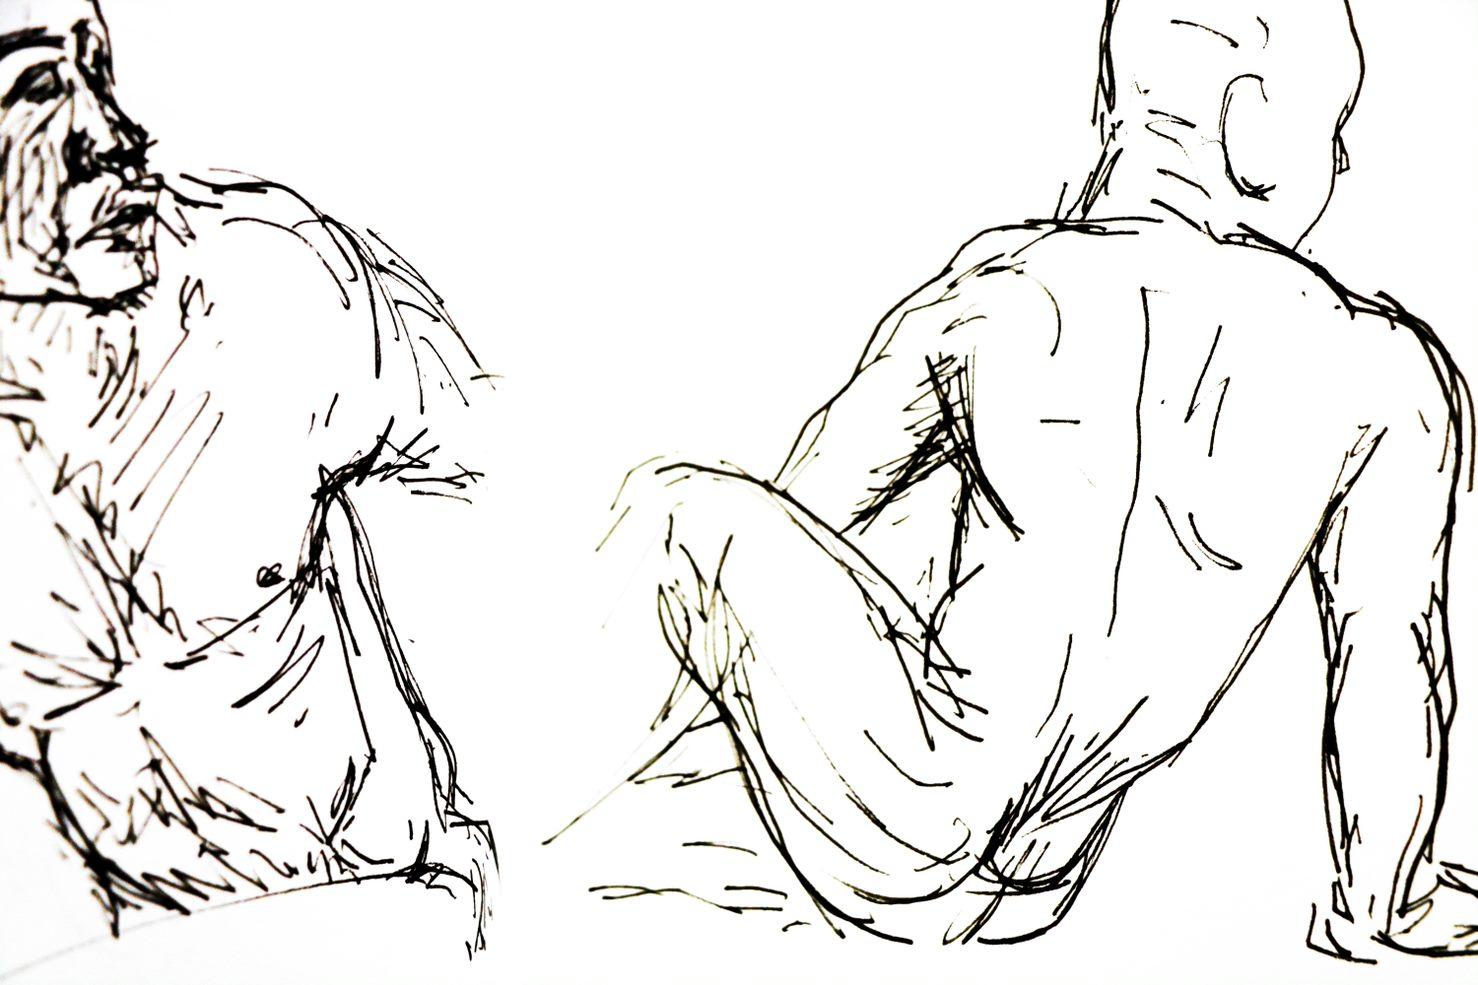 Anatomical Drawing - Intermediate